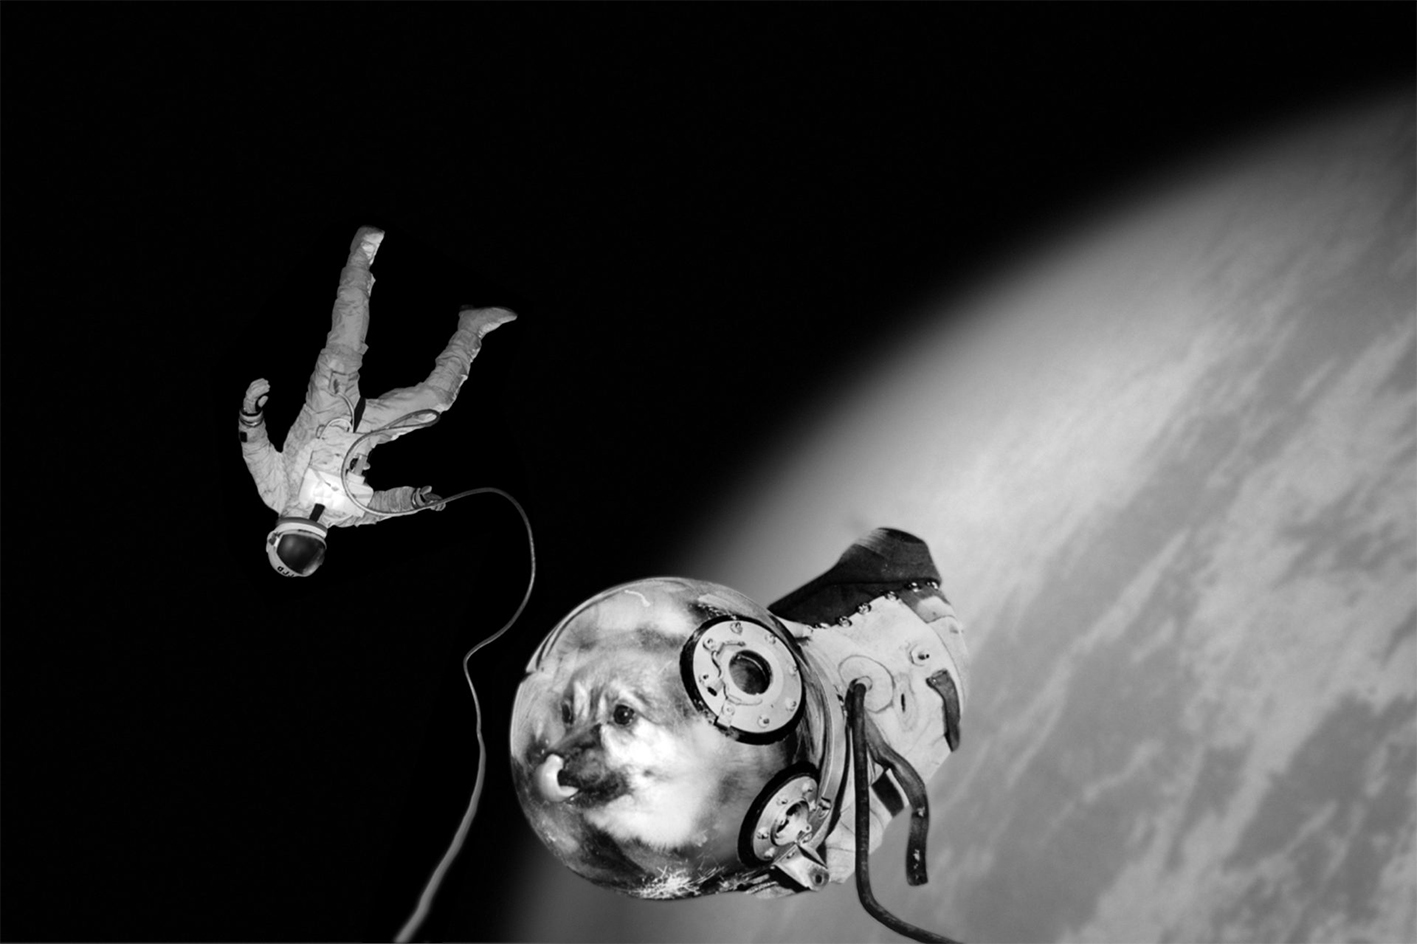 From the Sputnik series Ivan and Kloka performing their historical EVA Extra Vehicular Activity © Joan Fontcuberta